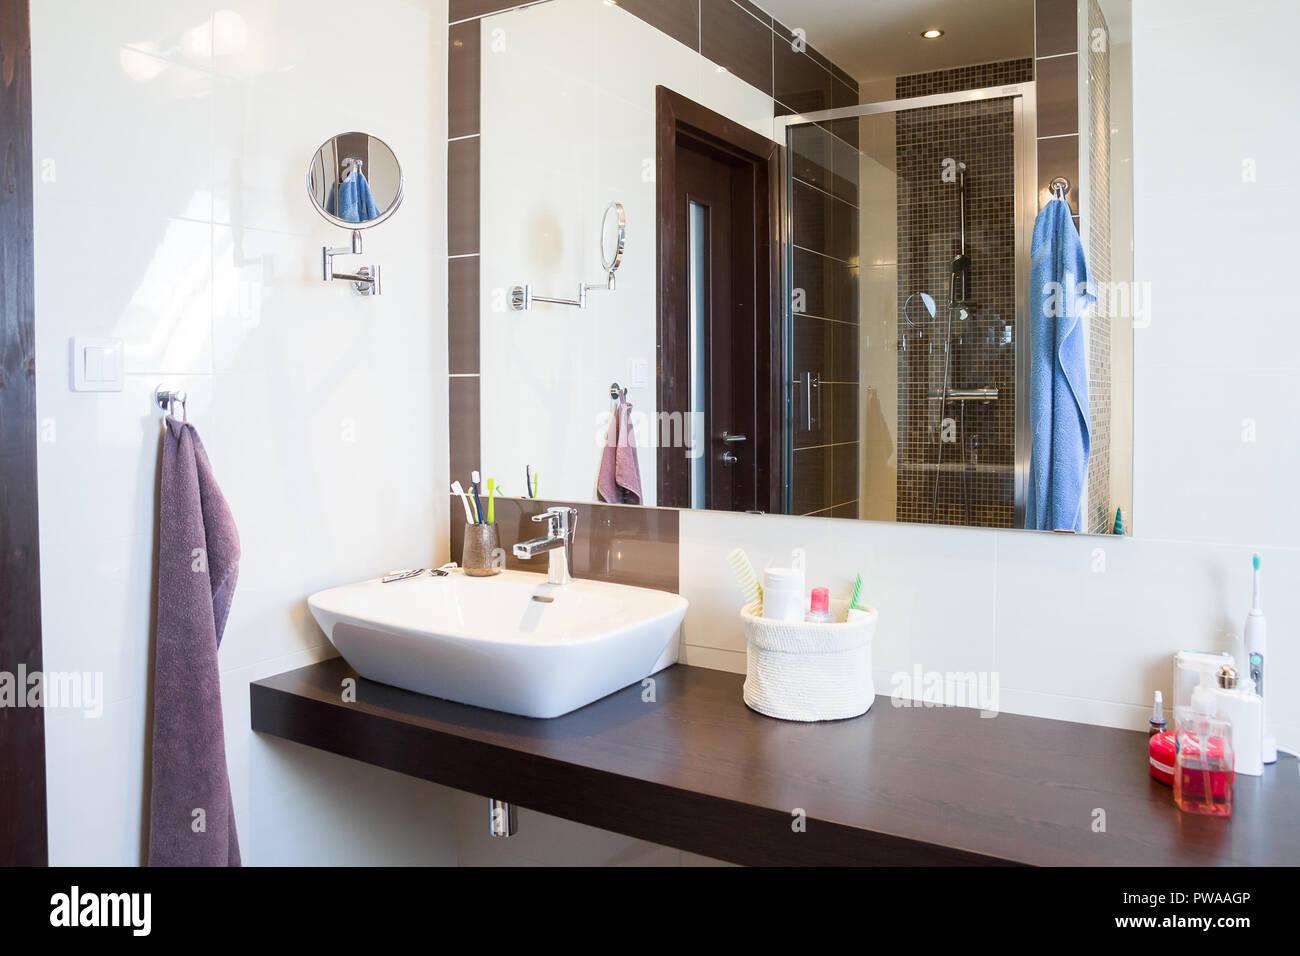 Moderne Badezimmer design Stockfoto, Bild: 222118646 - Alamy